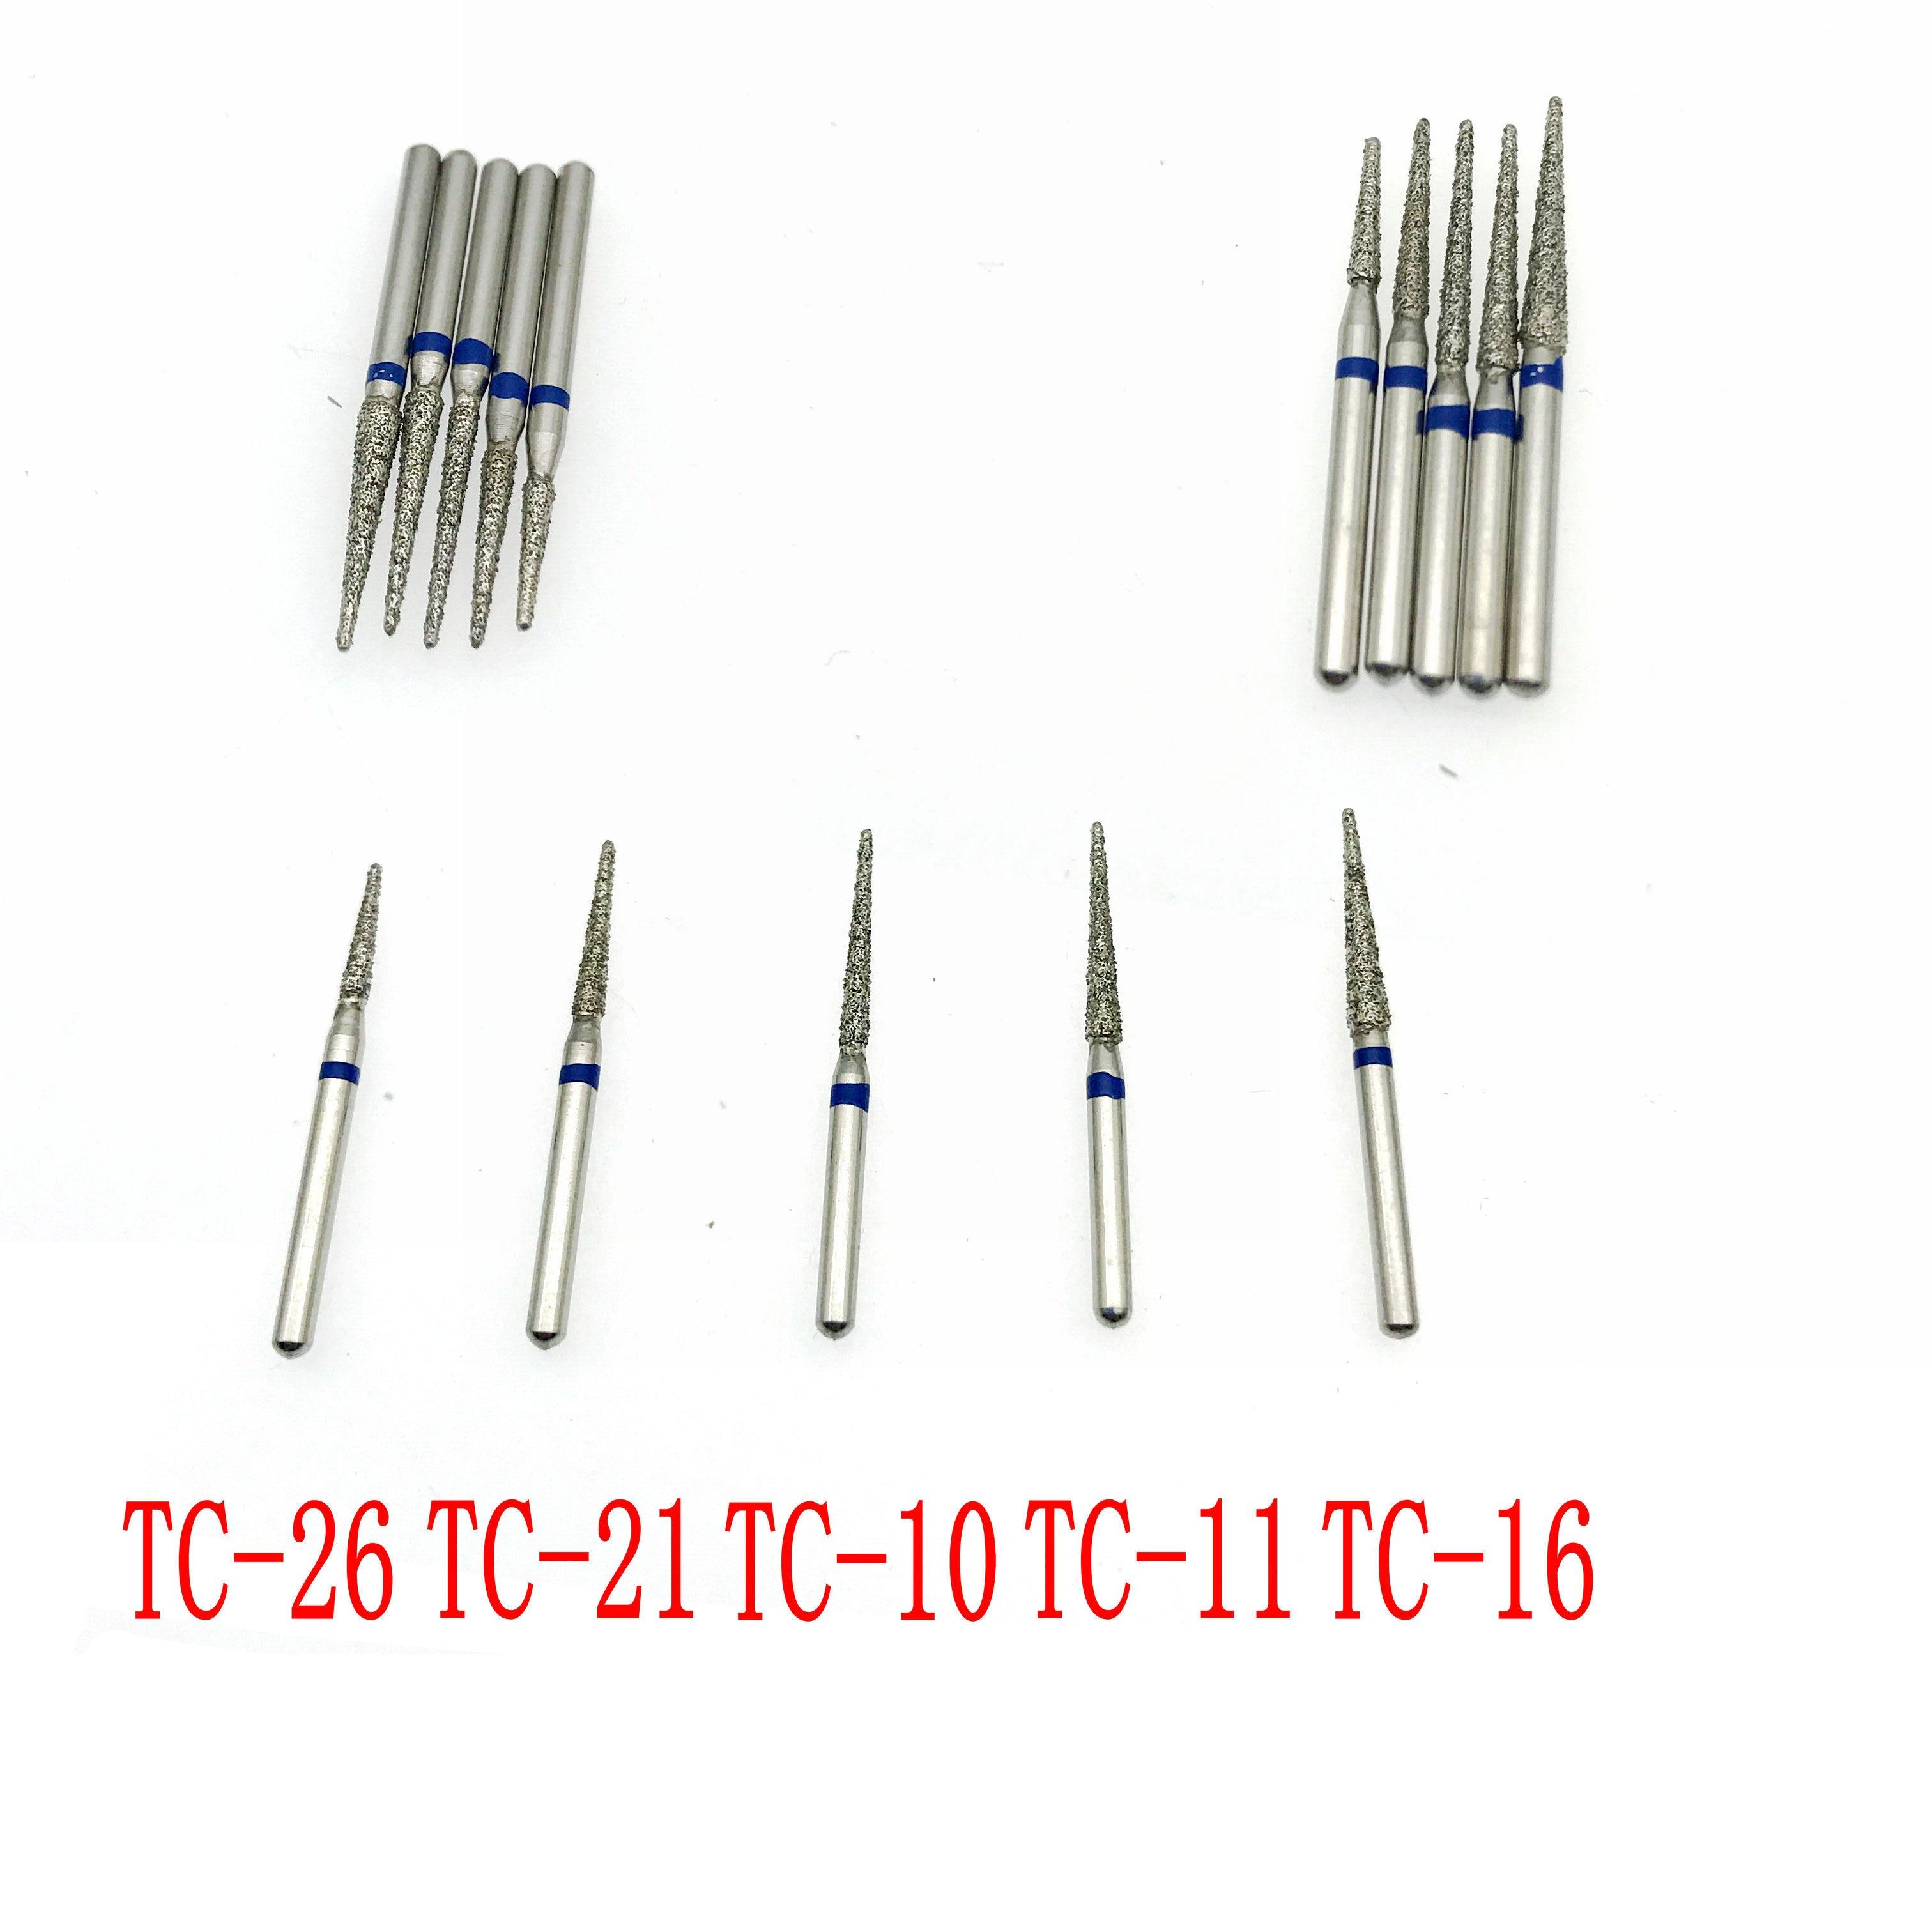 Fresas dentales de diamante de 50 Uds. Serie TC, fresas dentales de mano de alta velocidad TC26/TC21/TC10/TC11/TC16